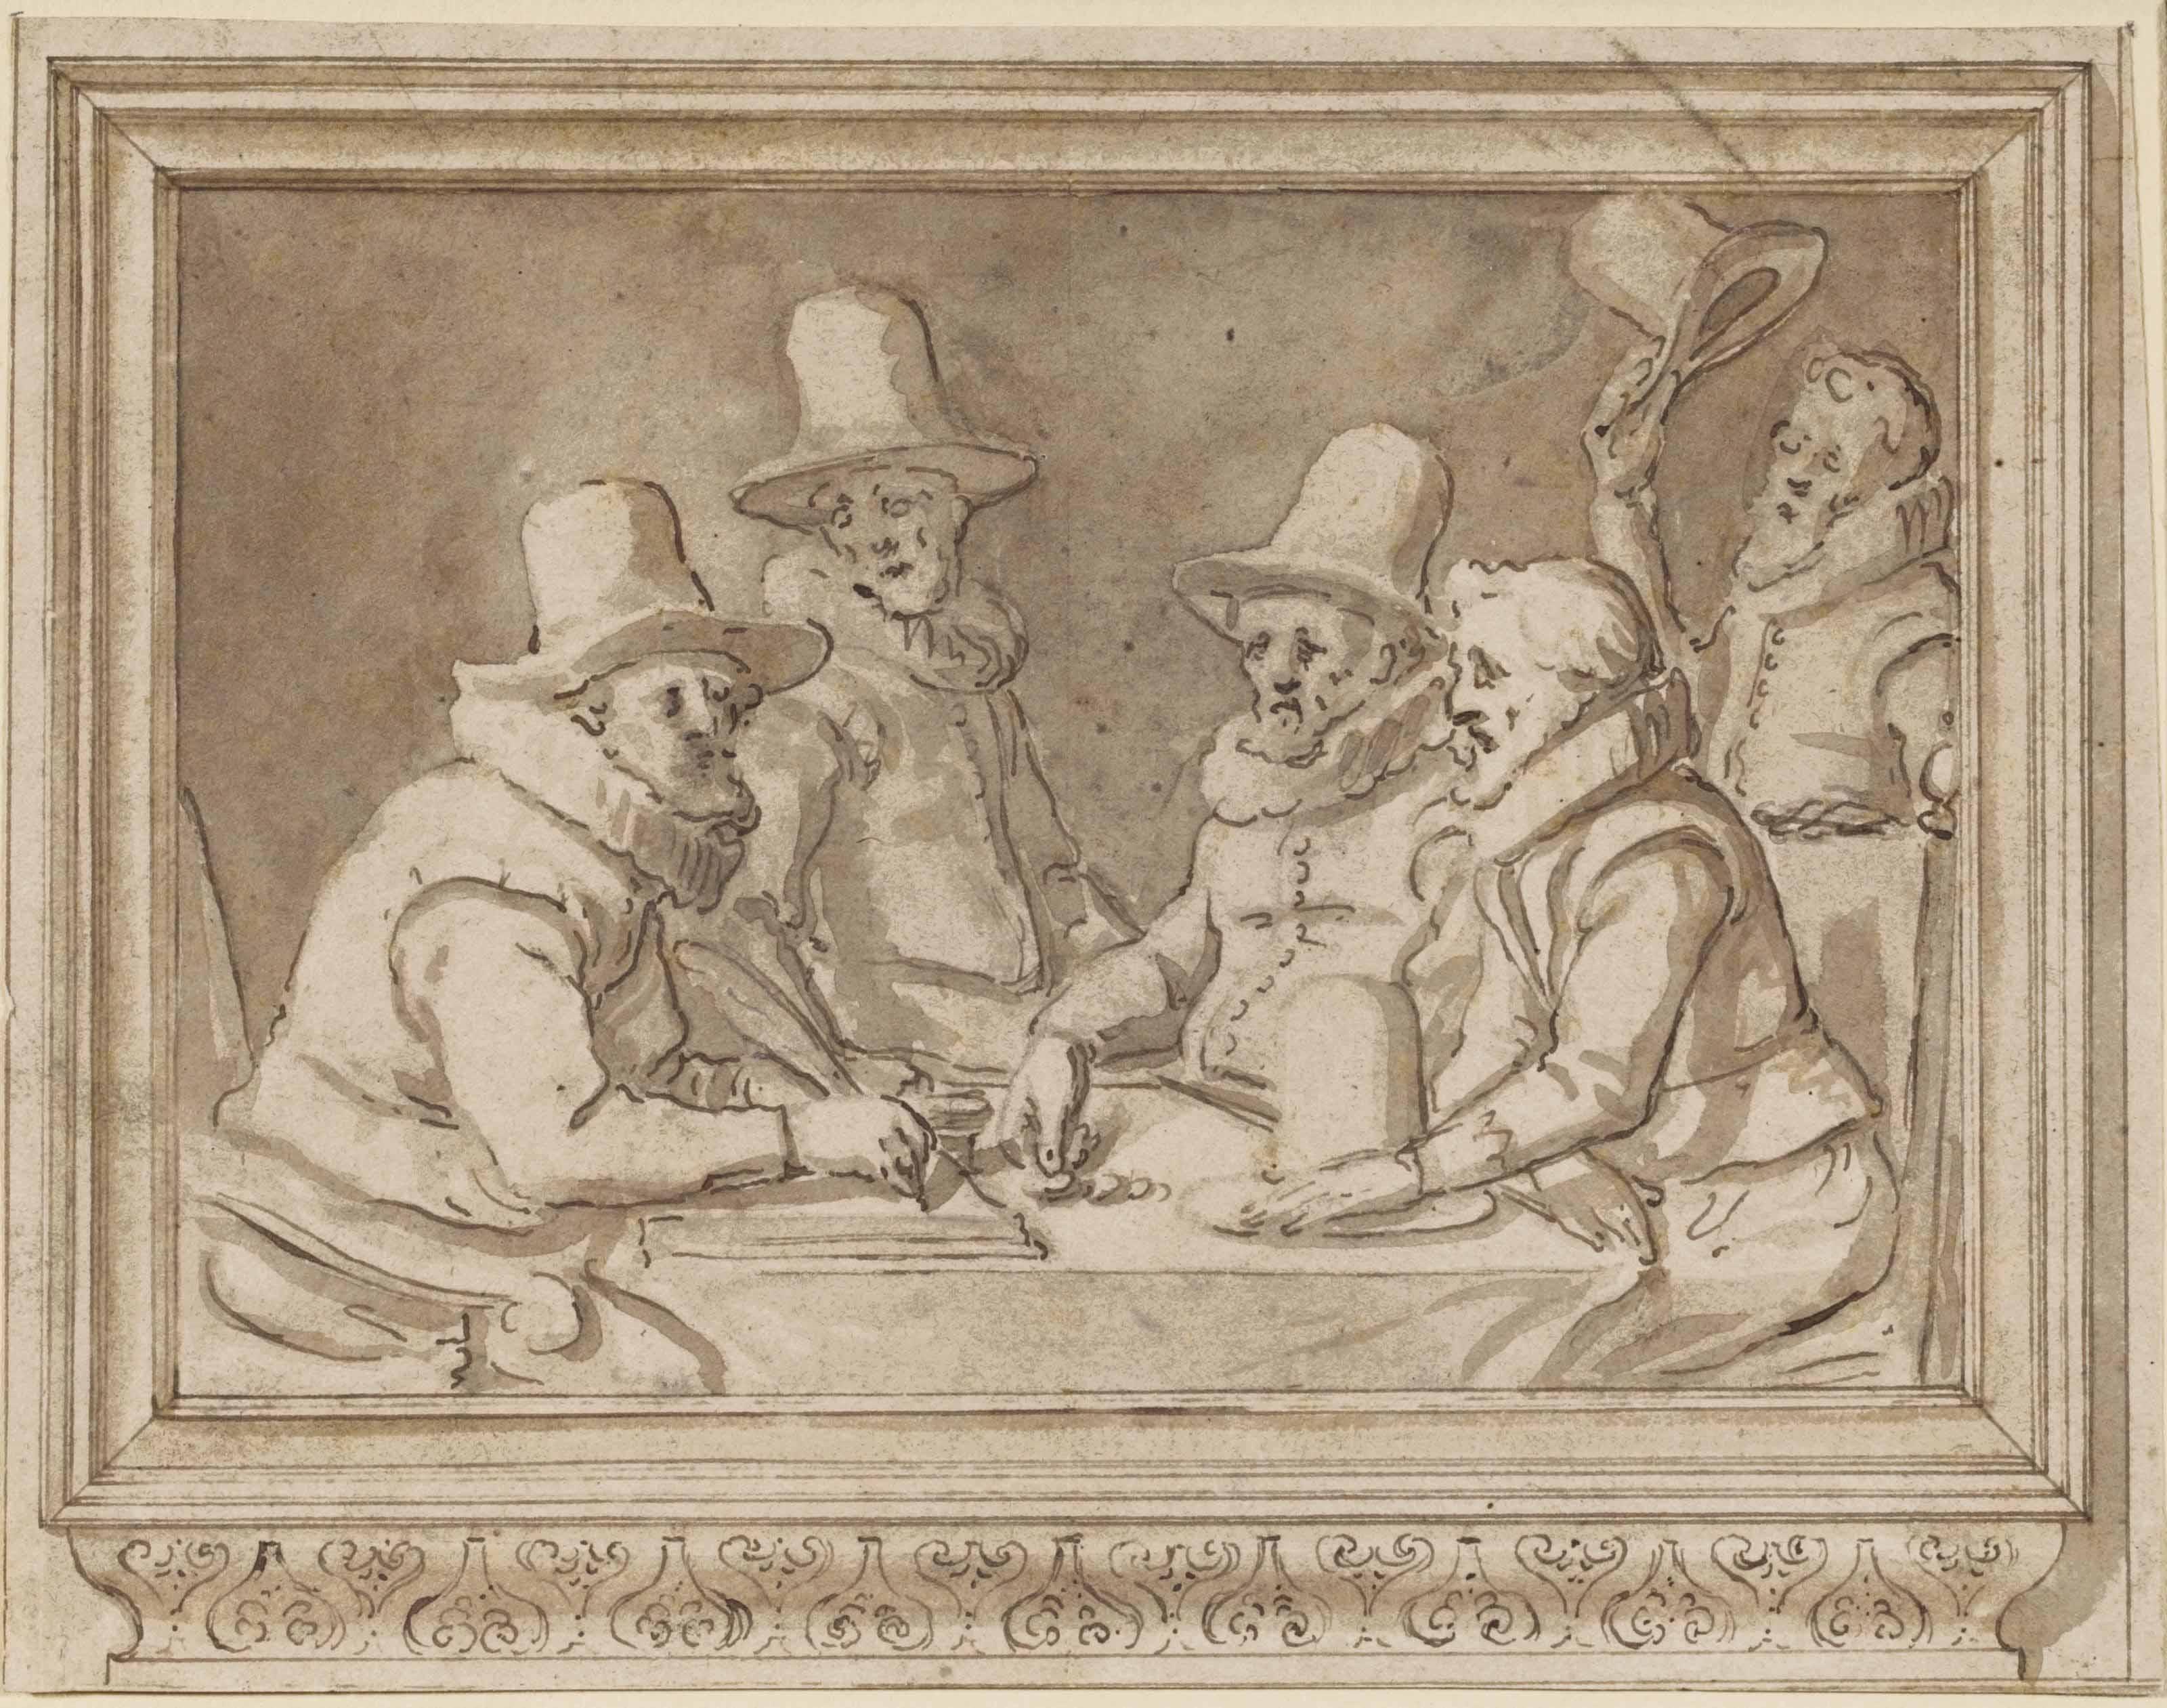 Thomas de Keijzer (Amsterdam 1596-1667)